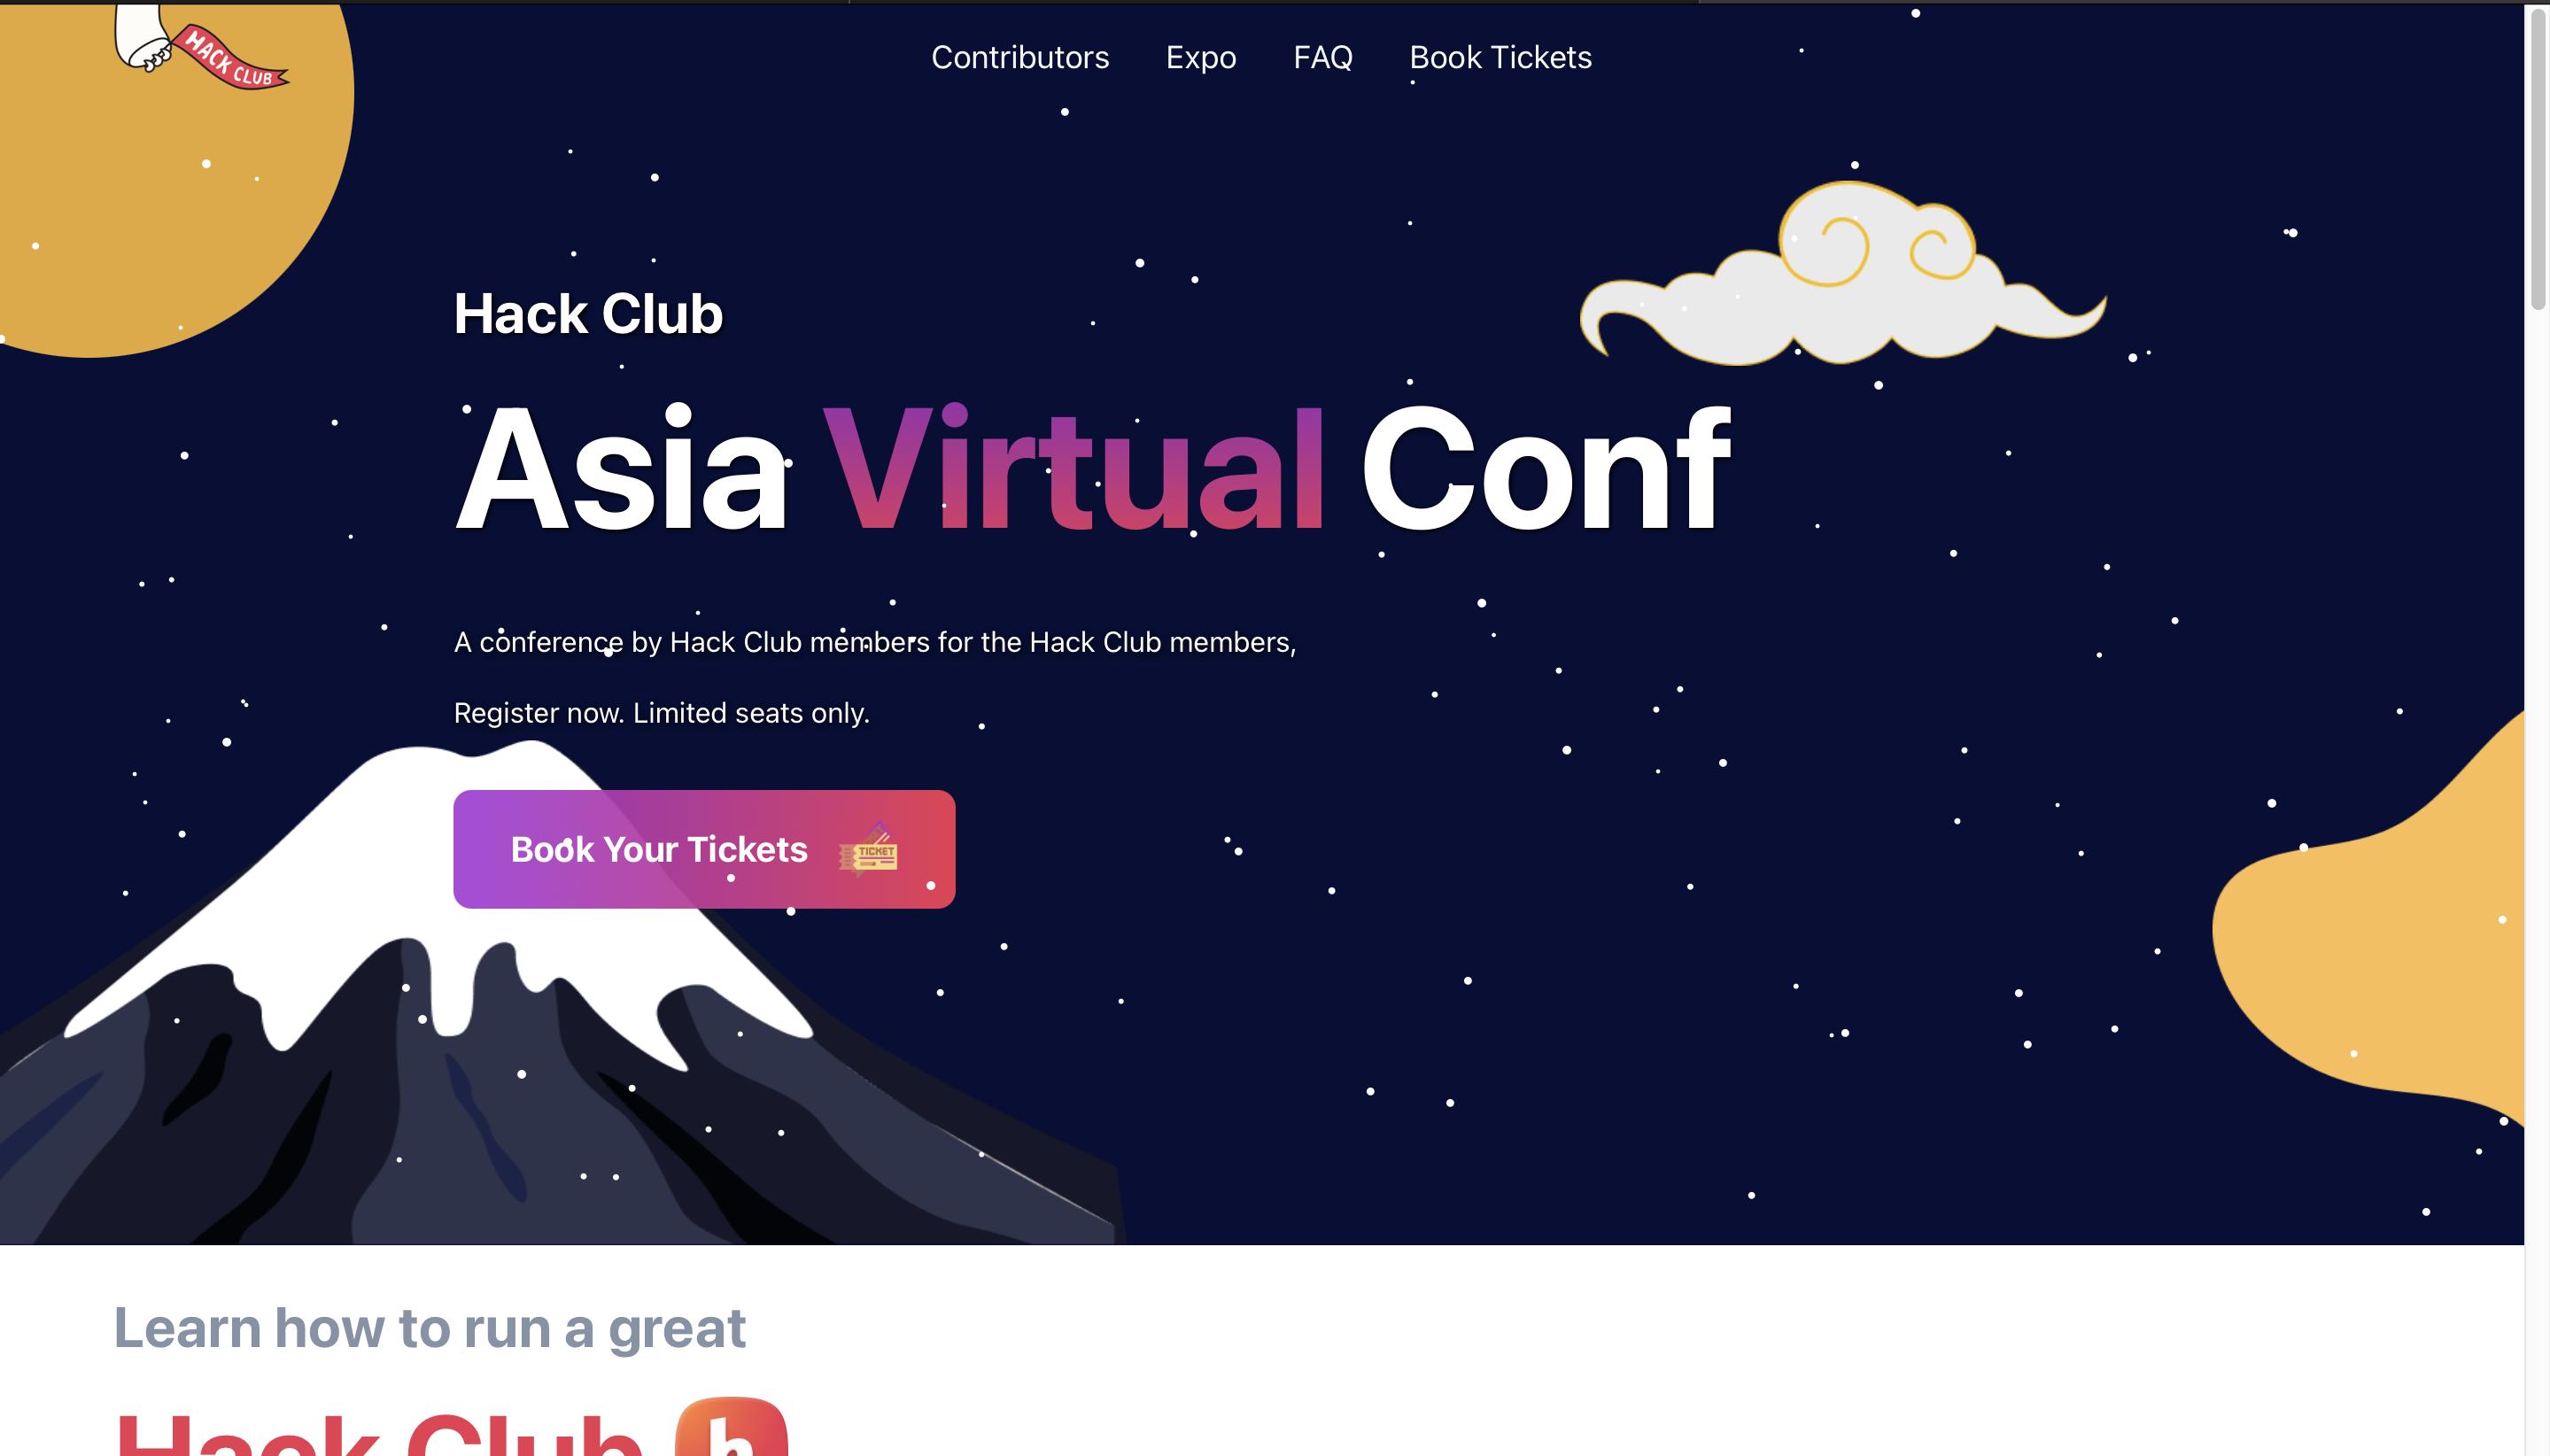 https://cloud-mklrkfcqc-hack-club-bot.vercel.app/0screenshot_2021-03-24_at_1.28.19_am.png